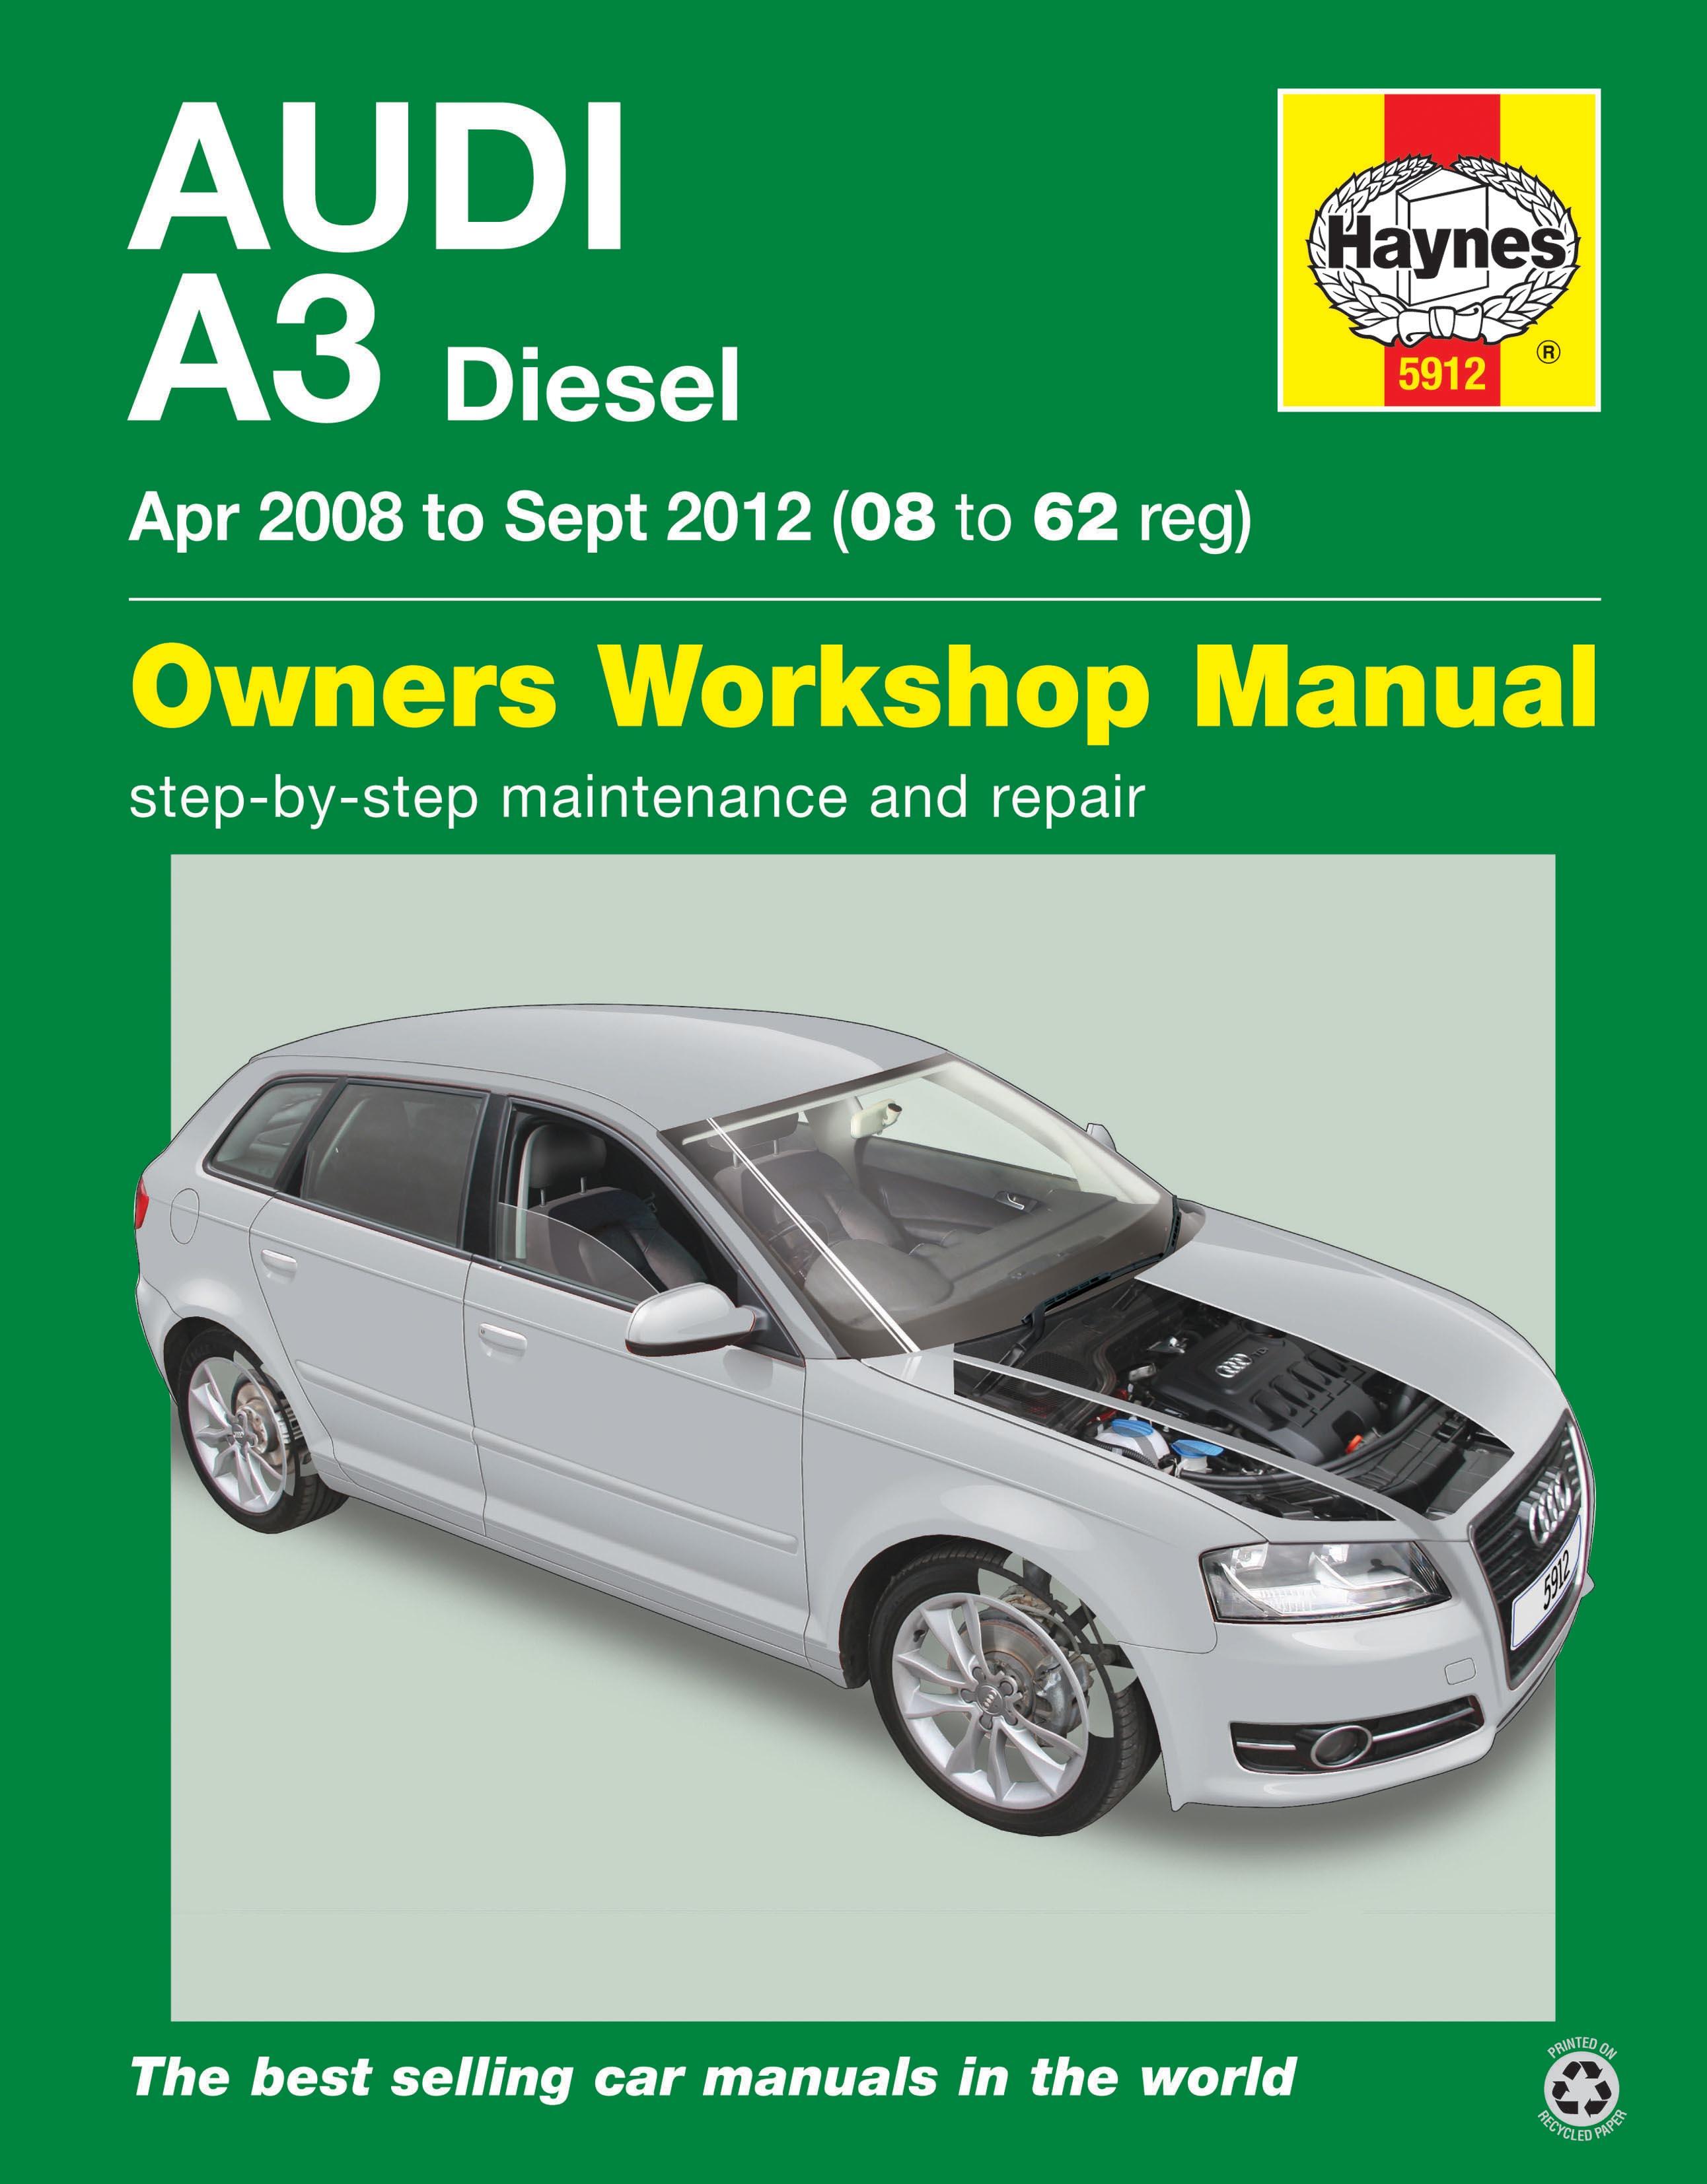 audi a3 08 12 techbooks cz rh techbooks cz Audi A3 Service Manual Audi A3 Hatchback